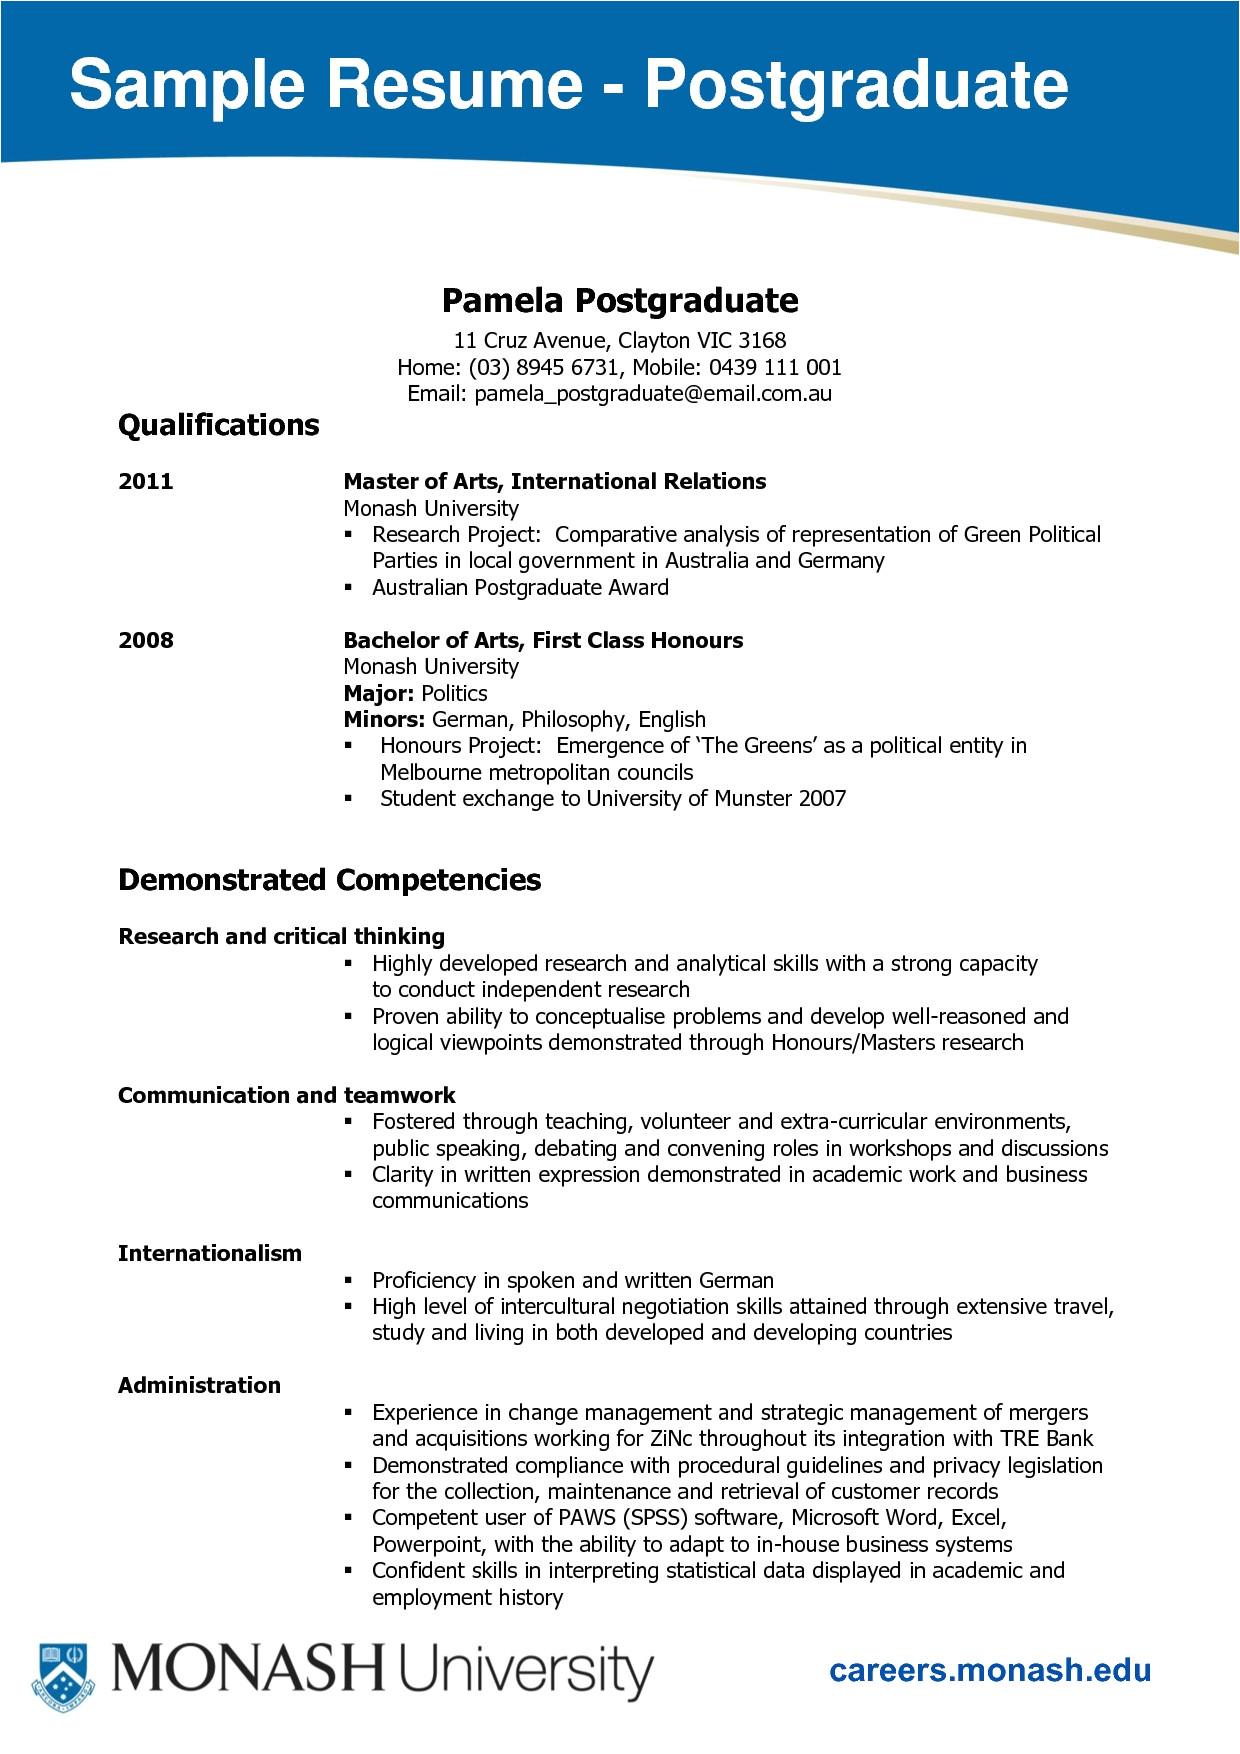 monash resume